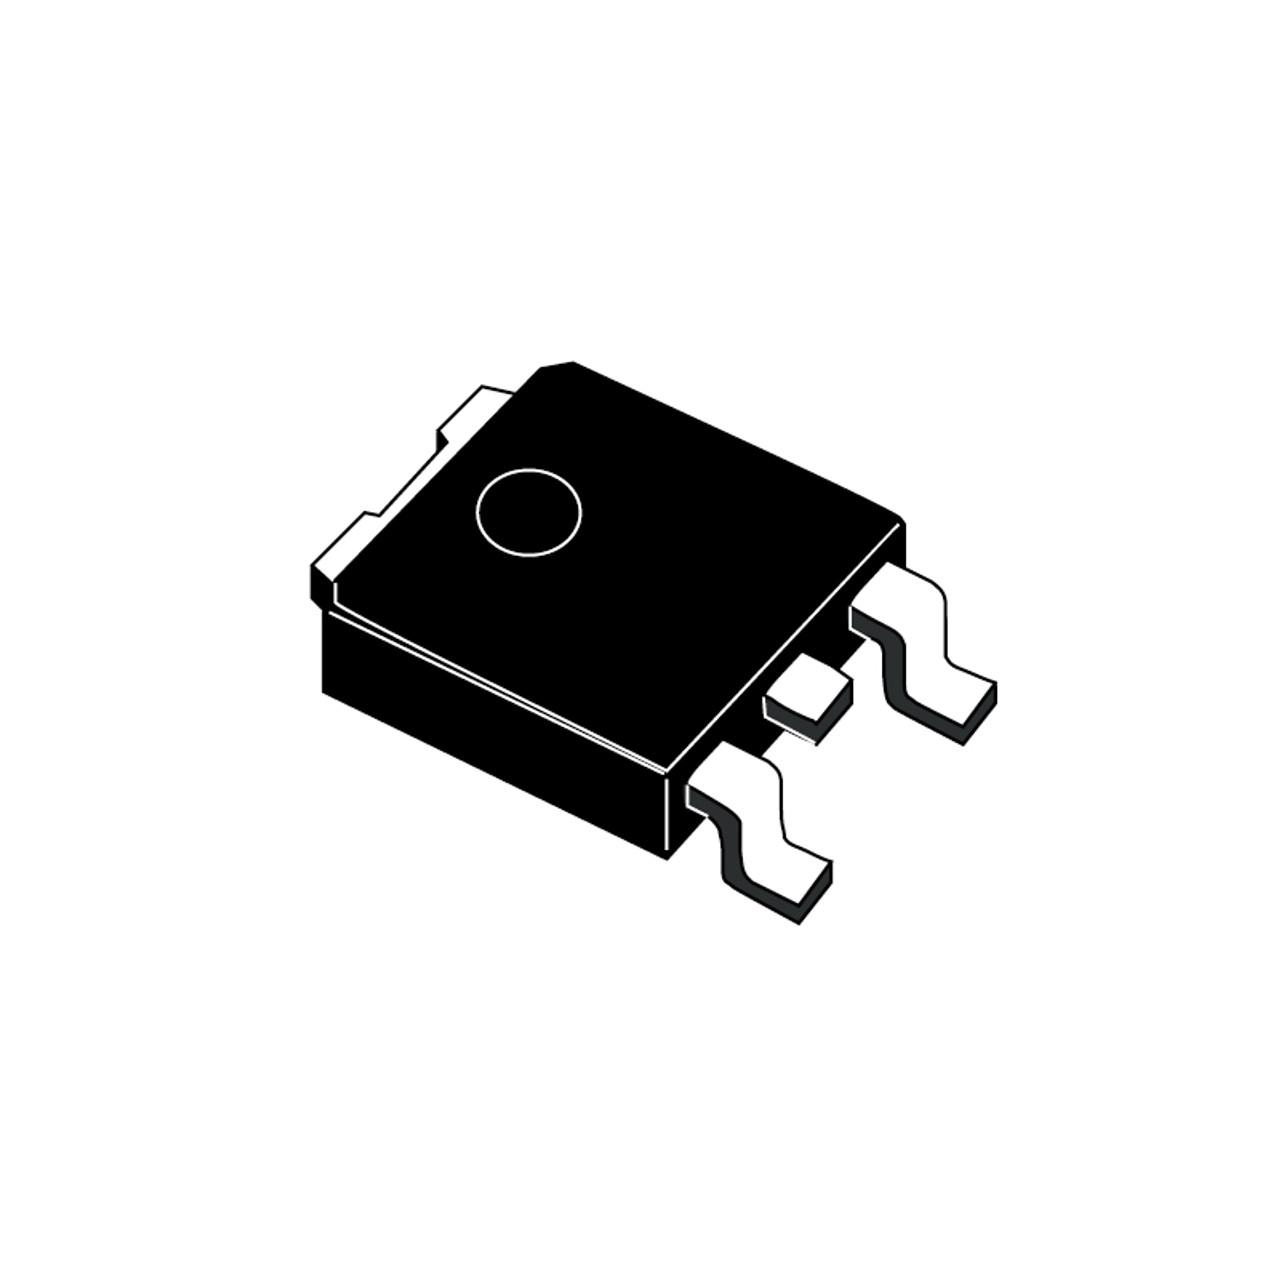 Cosmas Cabinet Hardware Polished Chrome Handles Pulls #1722CH